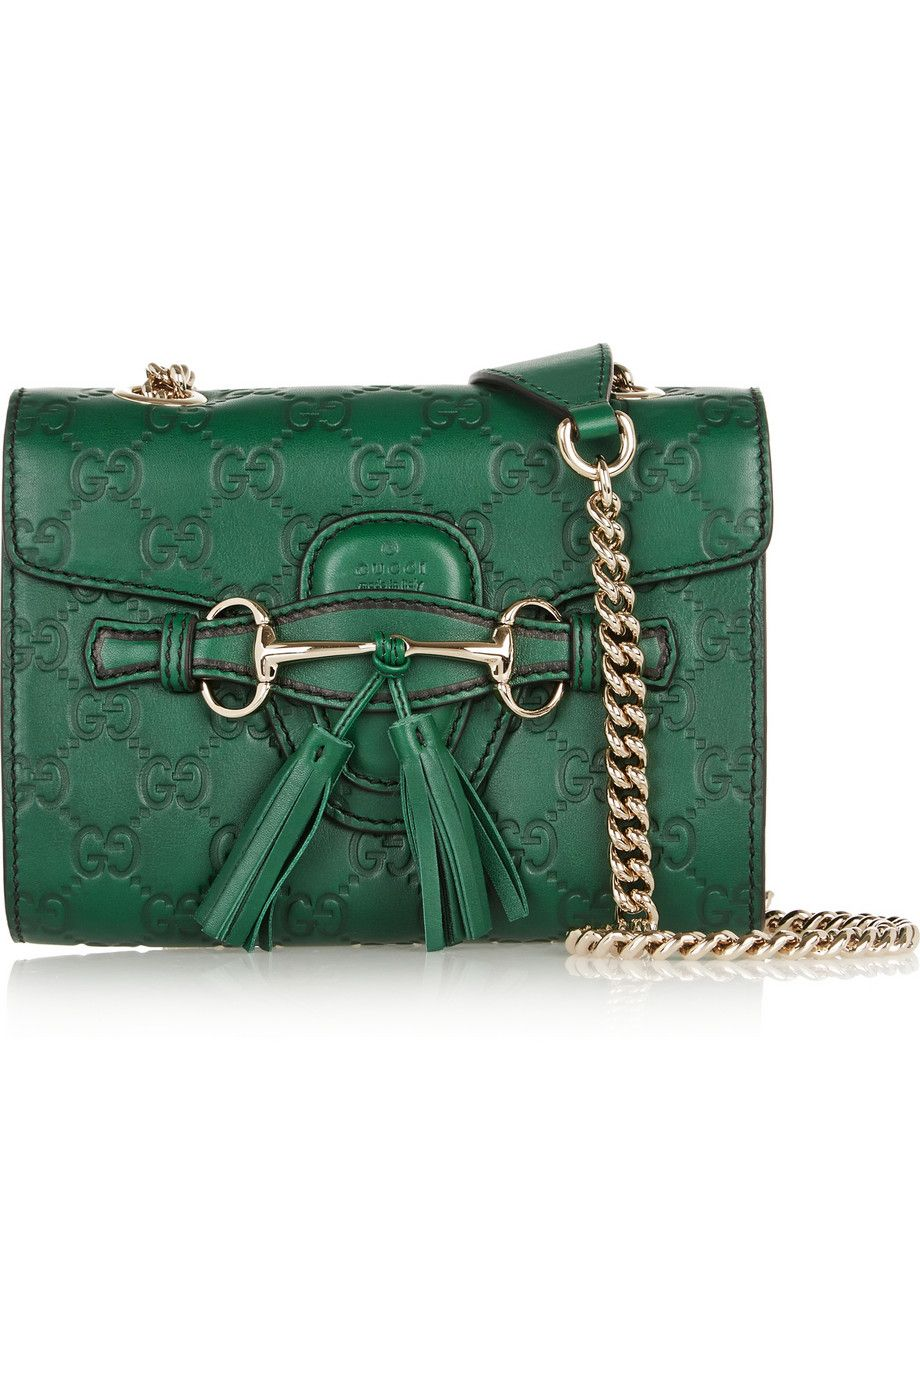 Gucci Emily mini embossed leather shoulder bag NET-A-PORTER.COM